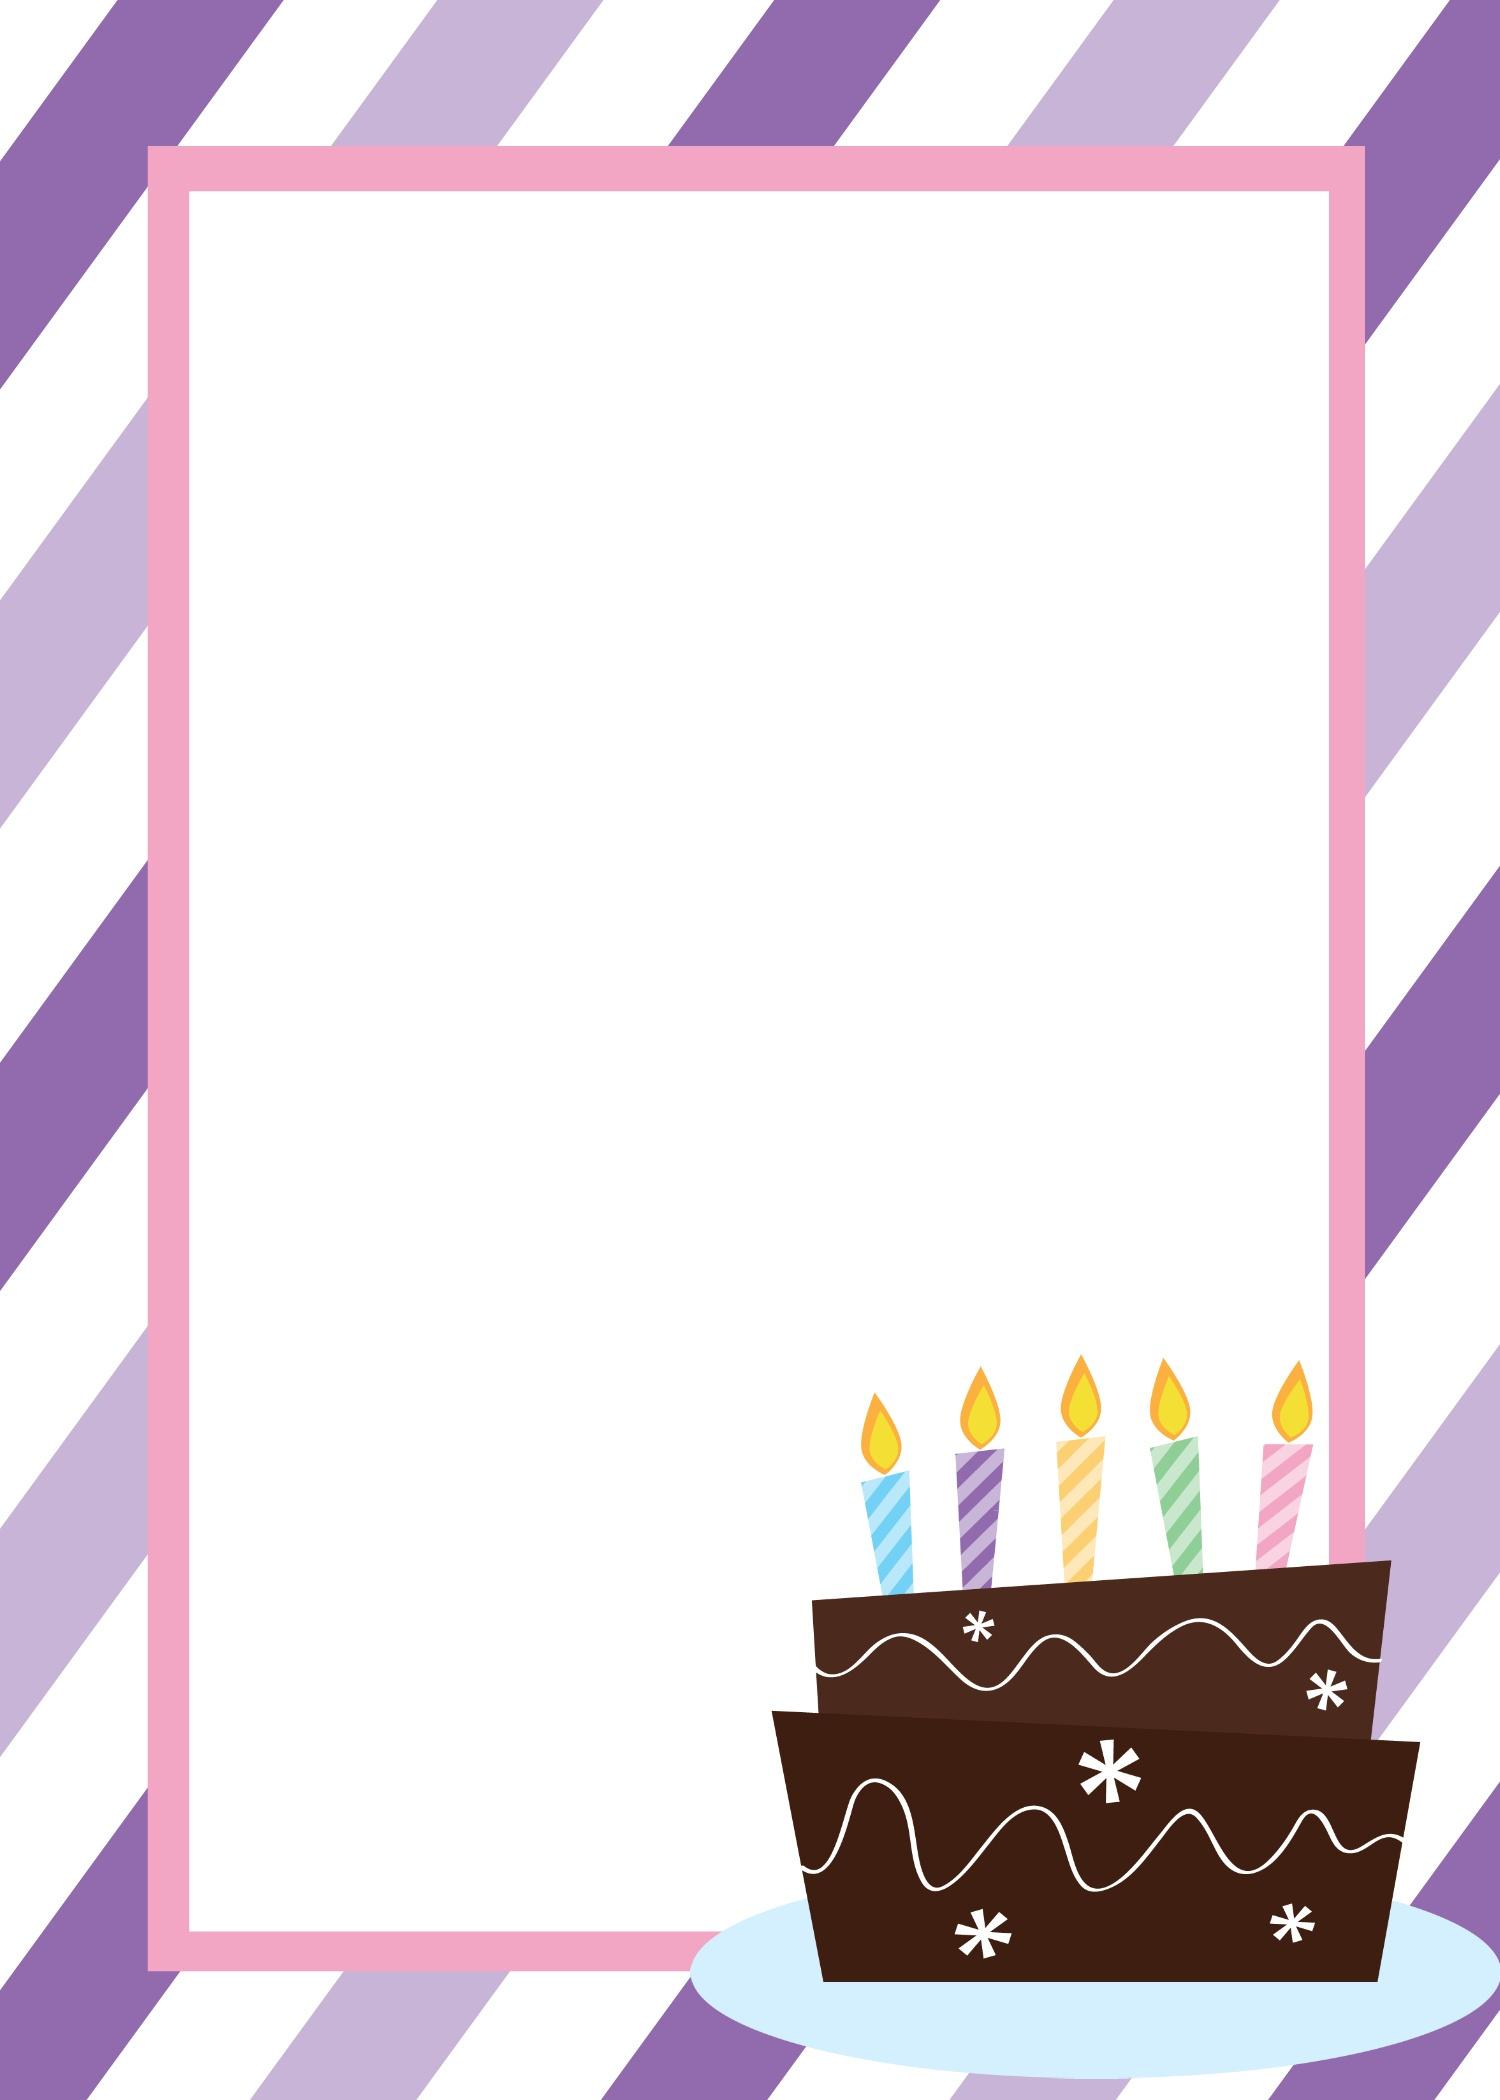 Free Printable Birthday Invitation Templates - Happy Birthday Invitations Free Printable